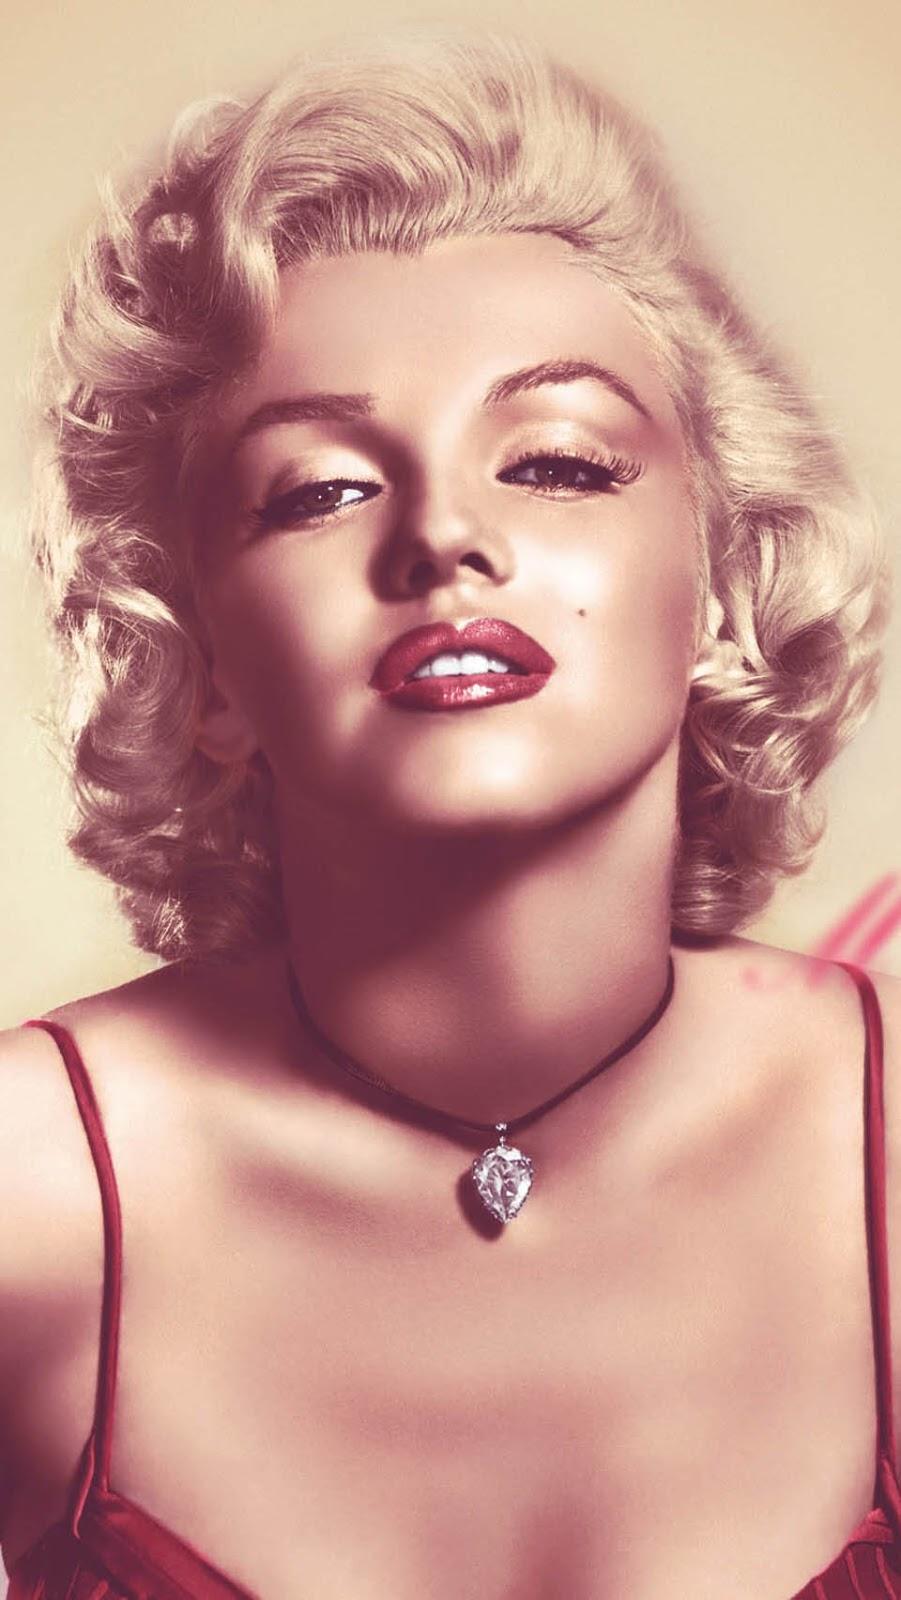 Beauty By Jessy Marilyn Monroe Iphone Wallpapers